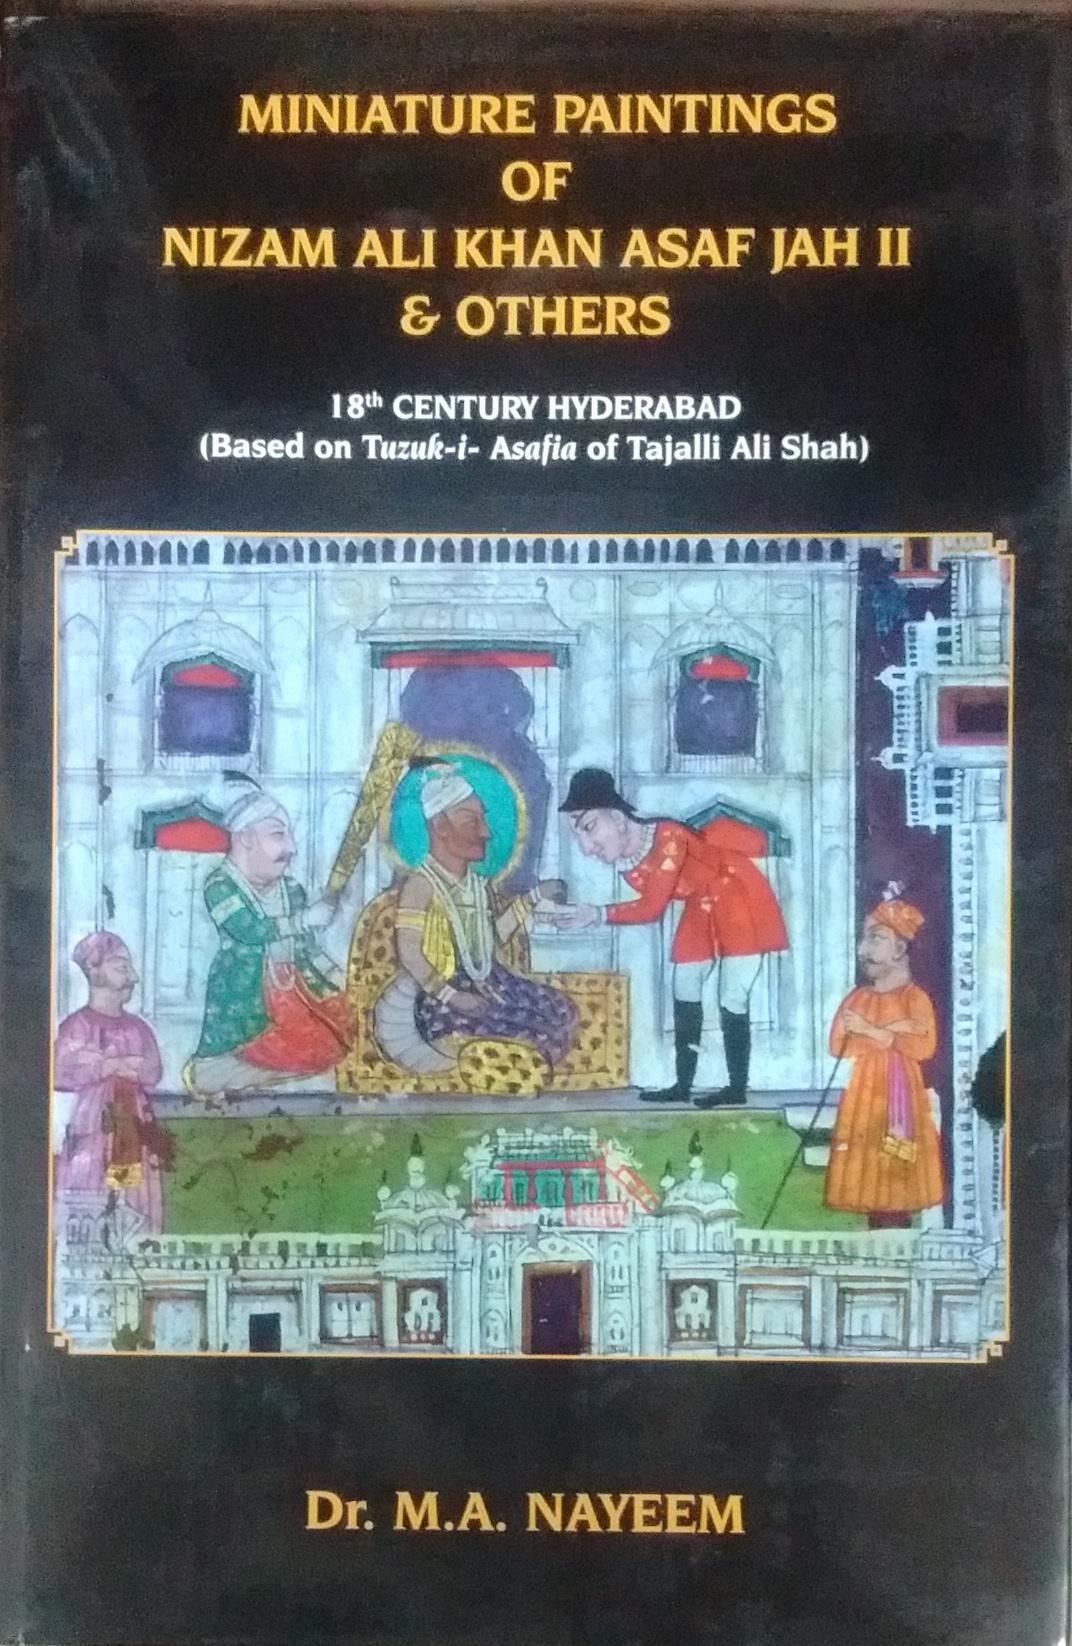 Miniature Paintings of Nizam Ali Khan Asaf Jah II …